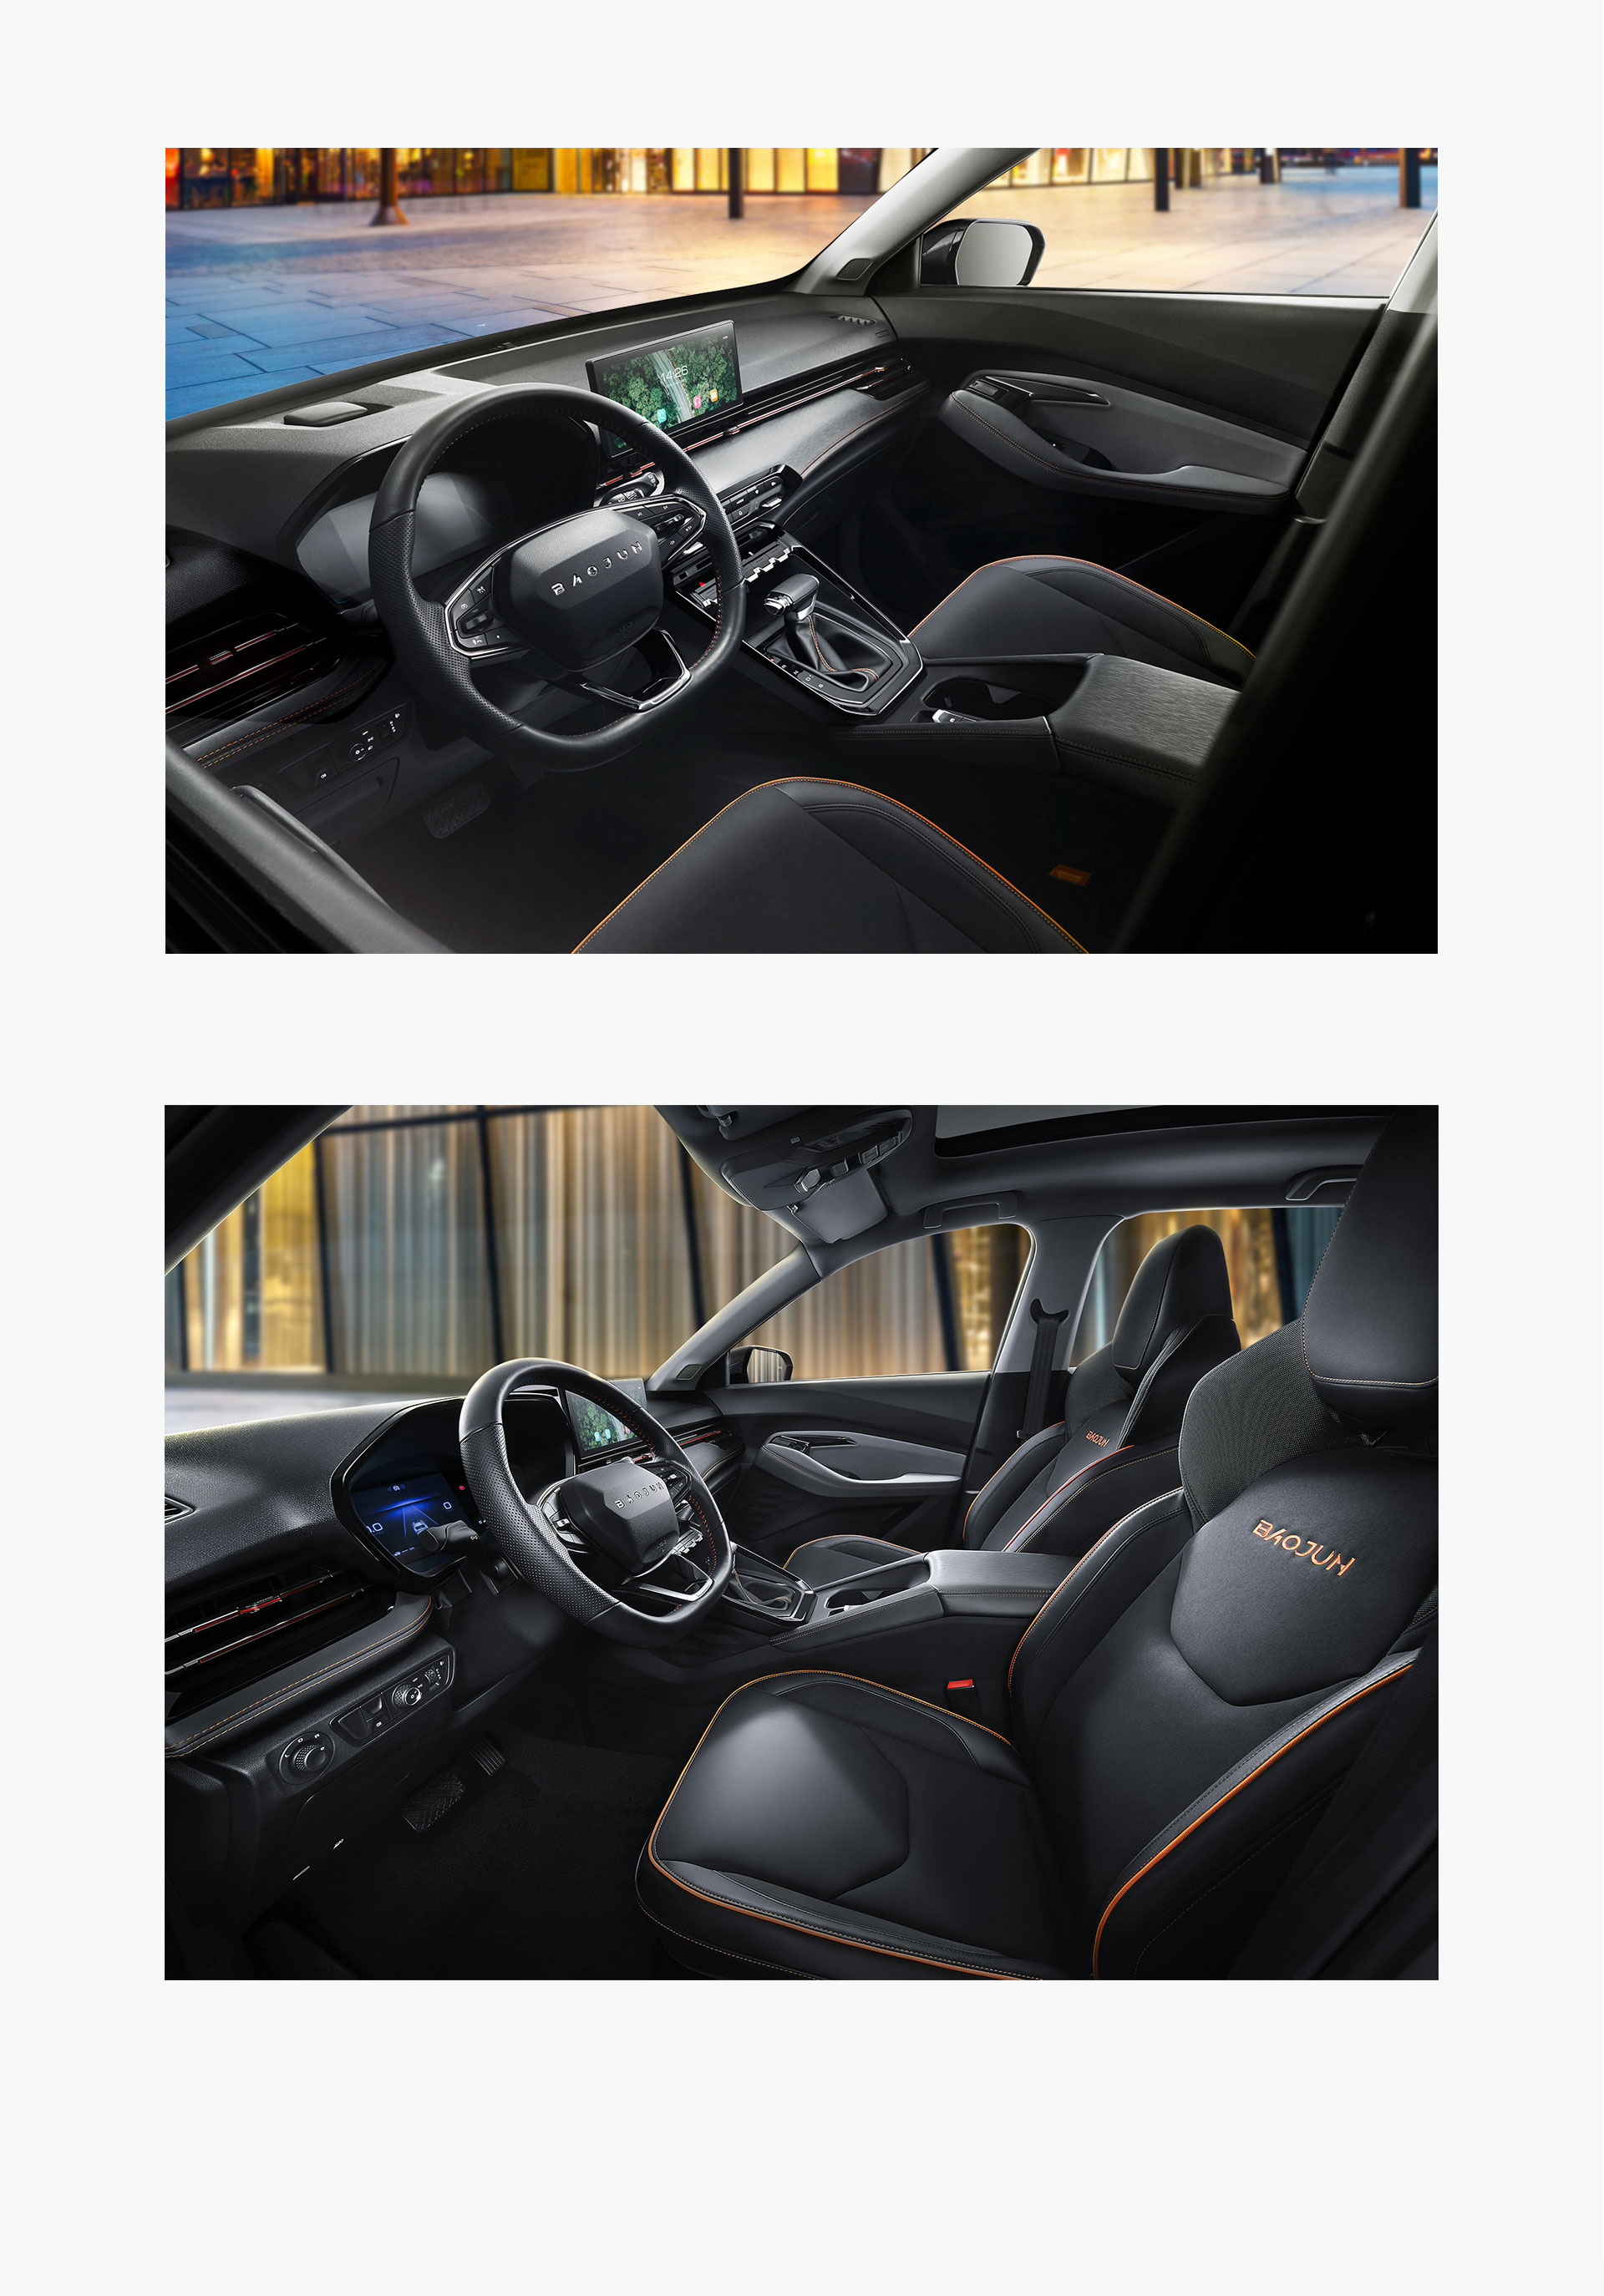 新寶駿RS-3,寶駿RS-3,寶駿RS3,圖片,智(zhi)能SUV,空間設計,數字科技空間,智(zhi)慧(hui)雙屏